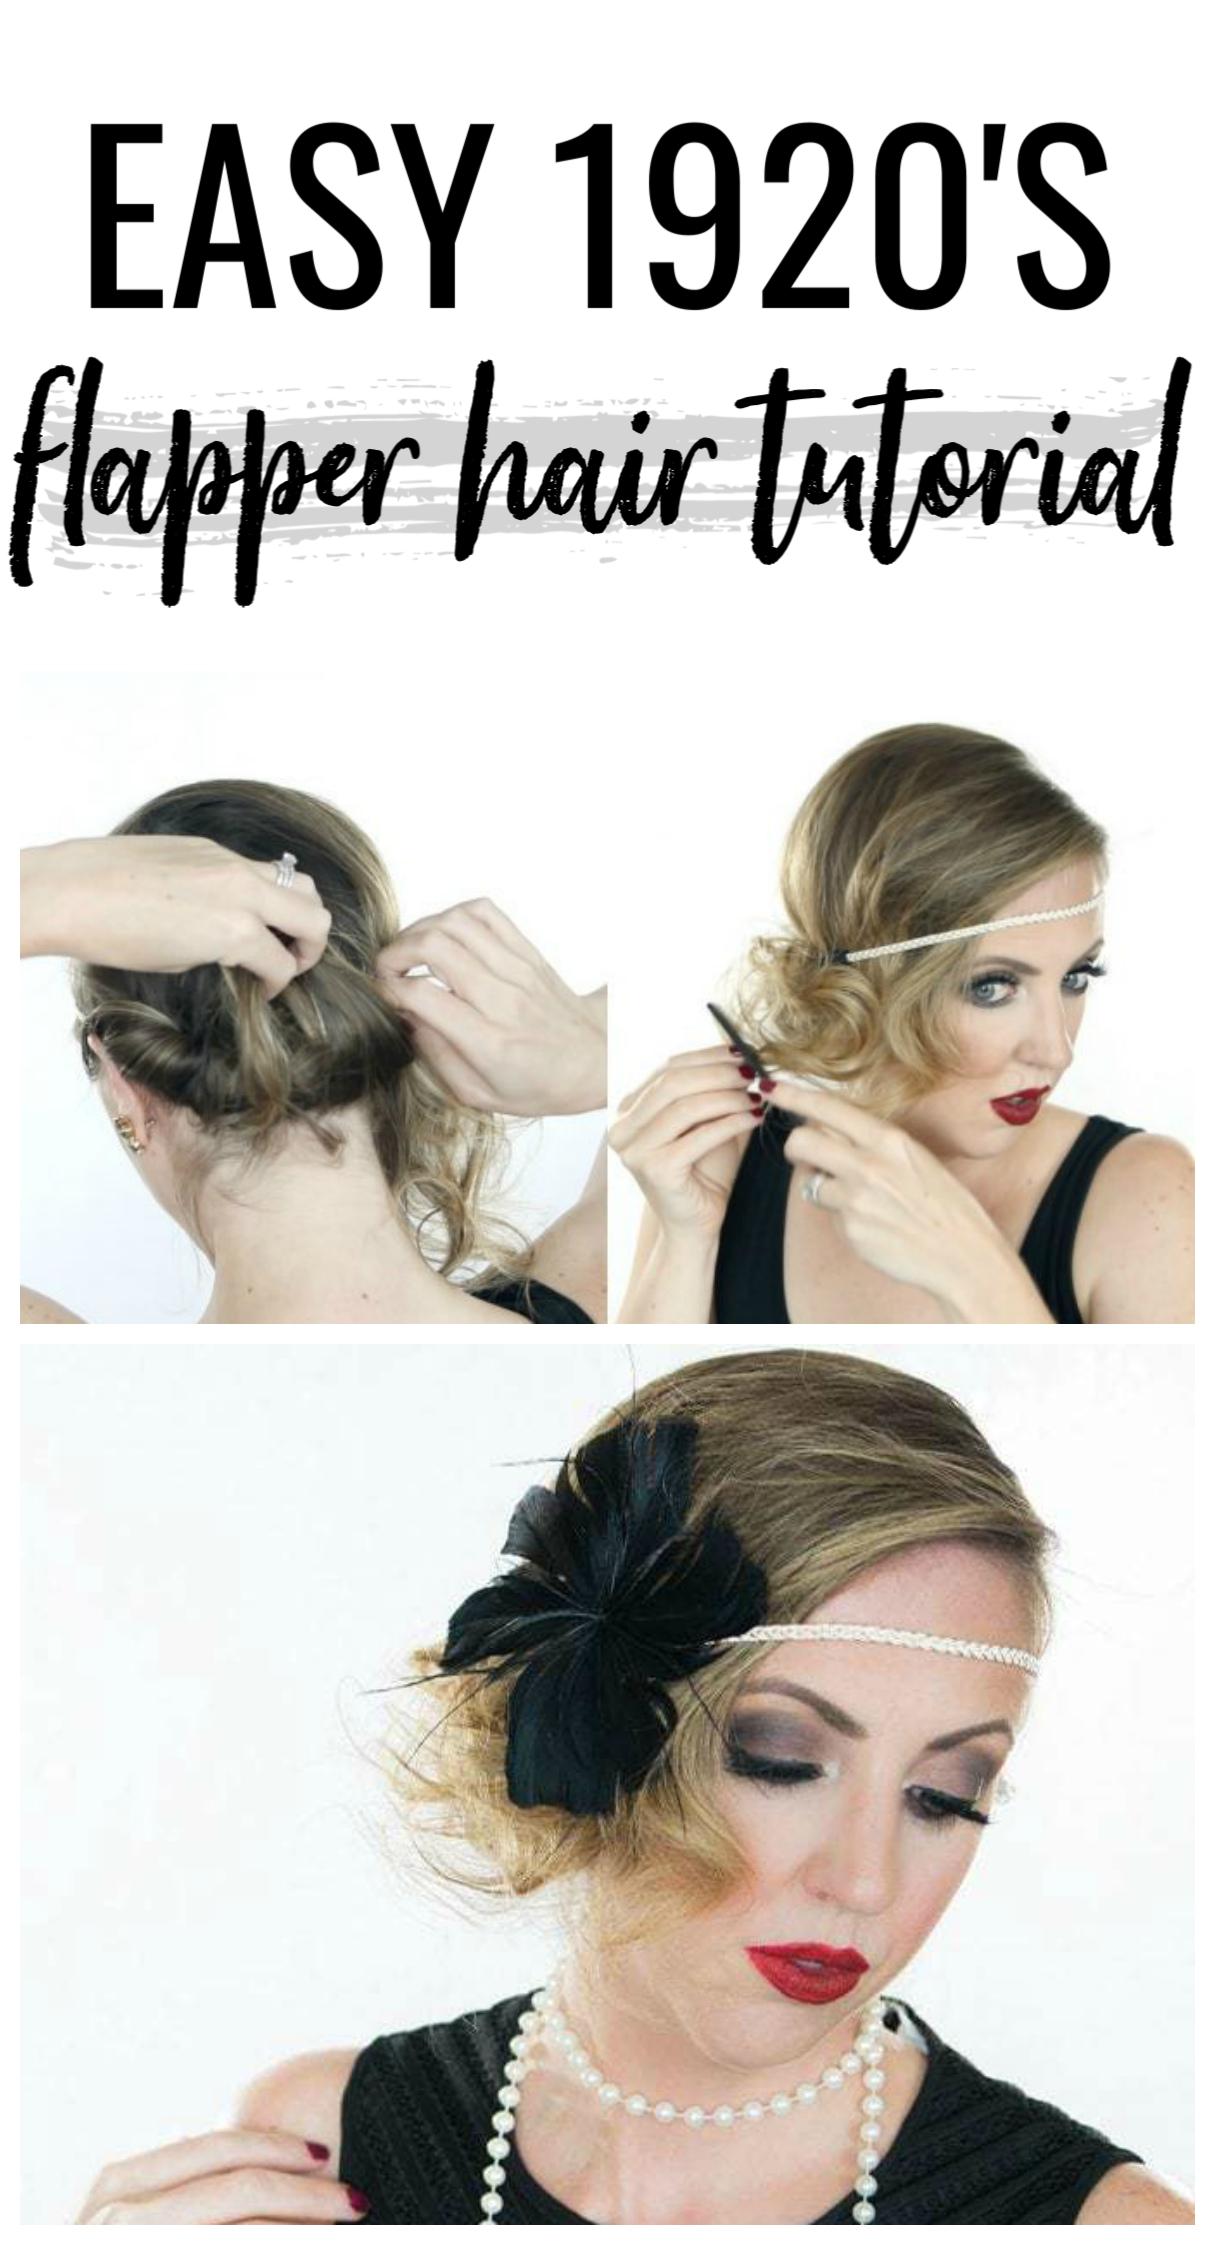 Easy 1920 S Flapper Hair Tutorial Flapperhair Easy And Fun 1920 S Flapper Hair Tutorial Flapper Hair 1920s Hair Tutorial Gatsby Hair